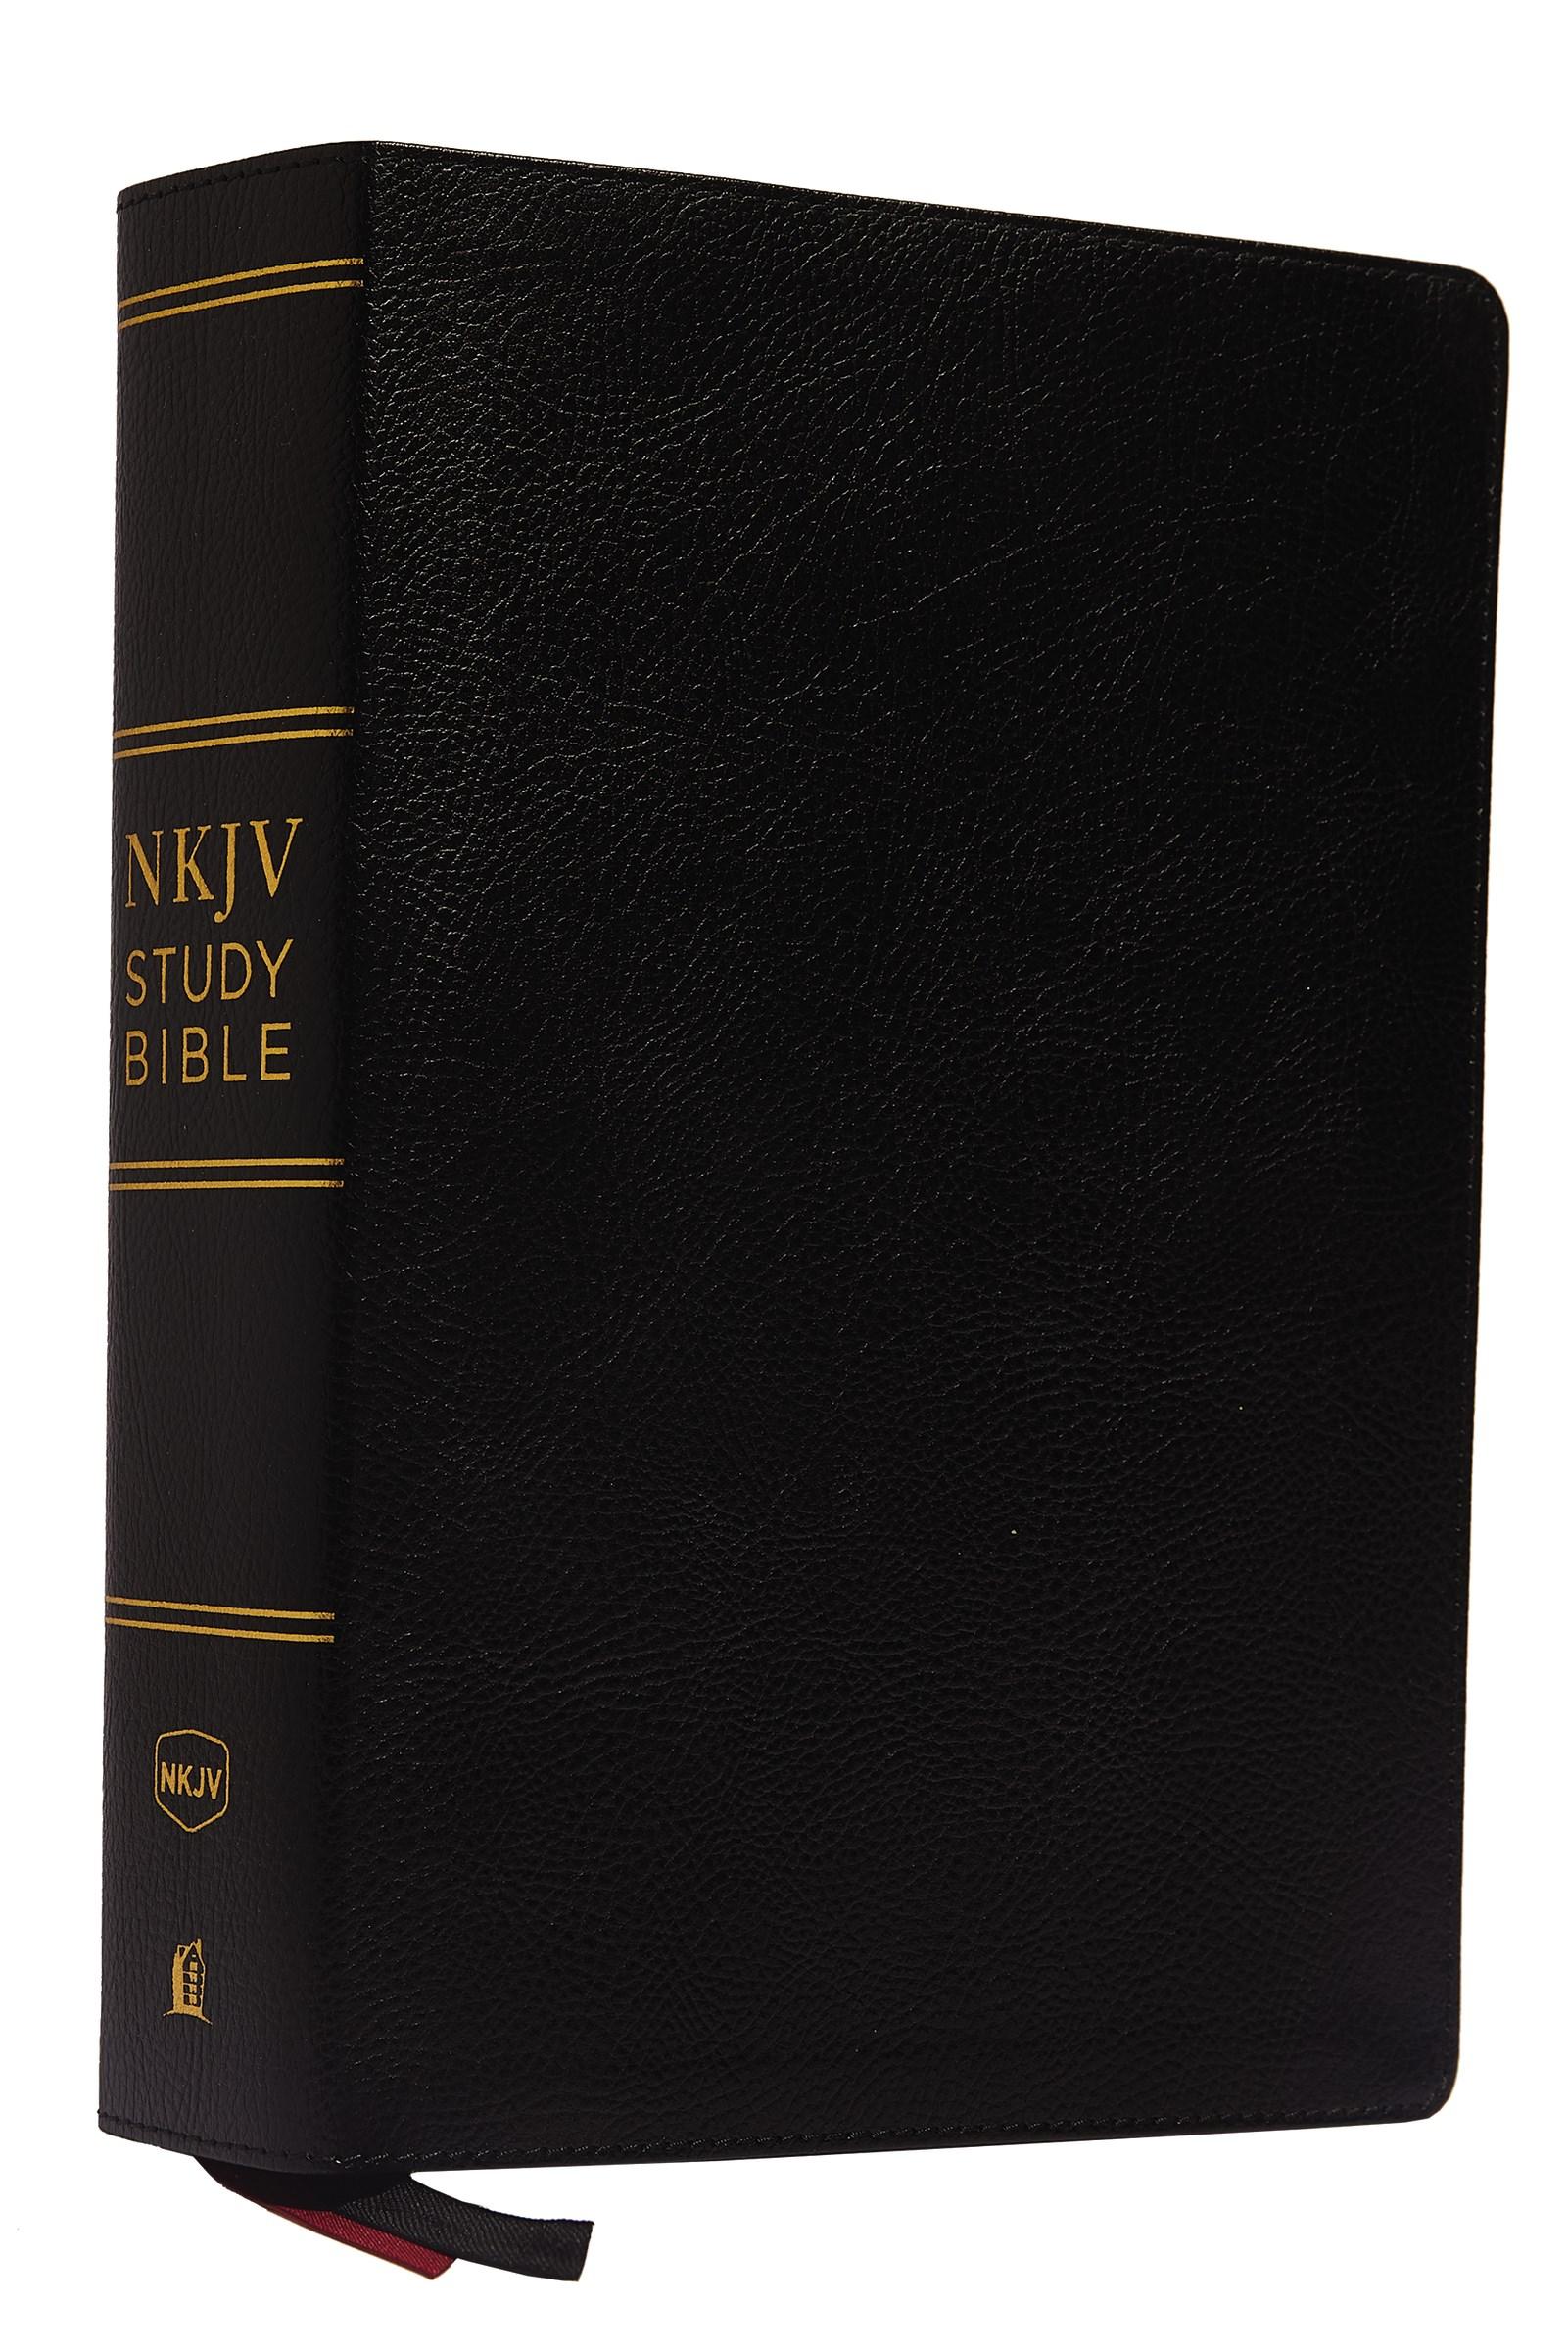 NKJV Study Bible (Comfort Print)-Black Premium Bonded Leather